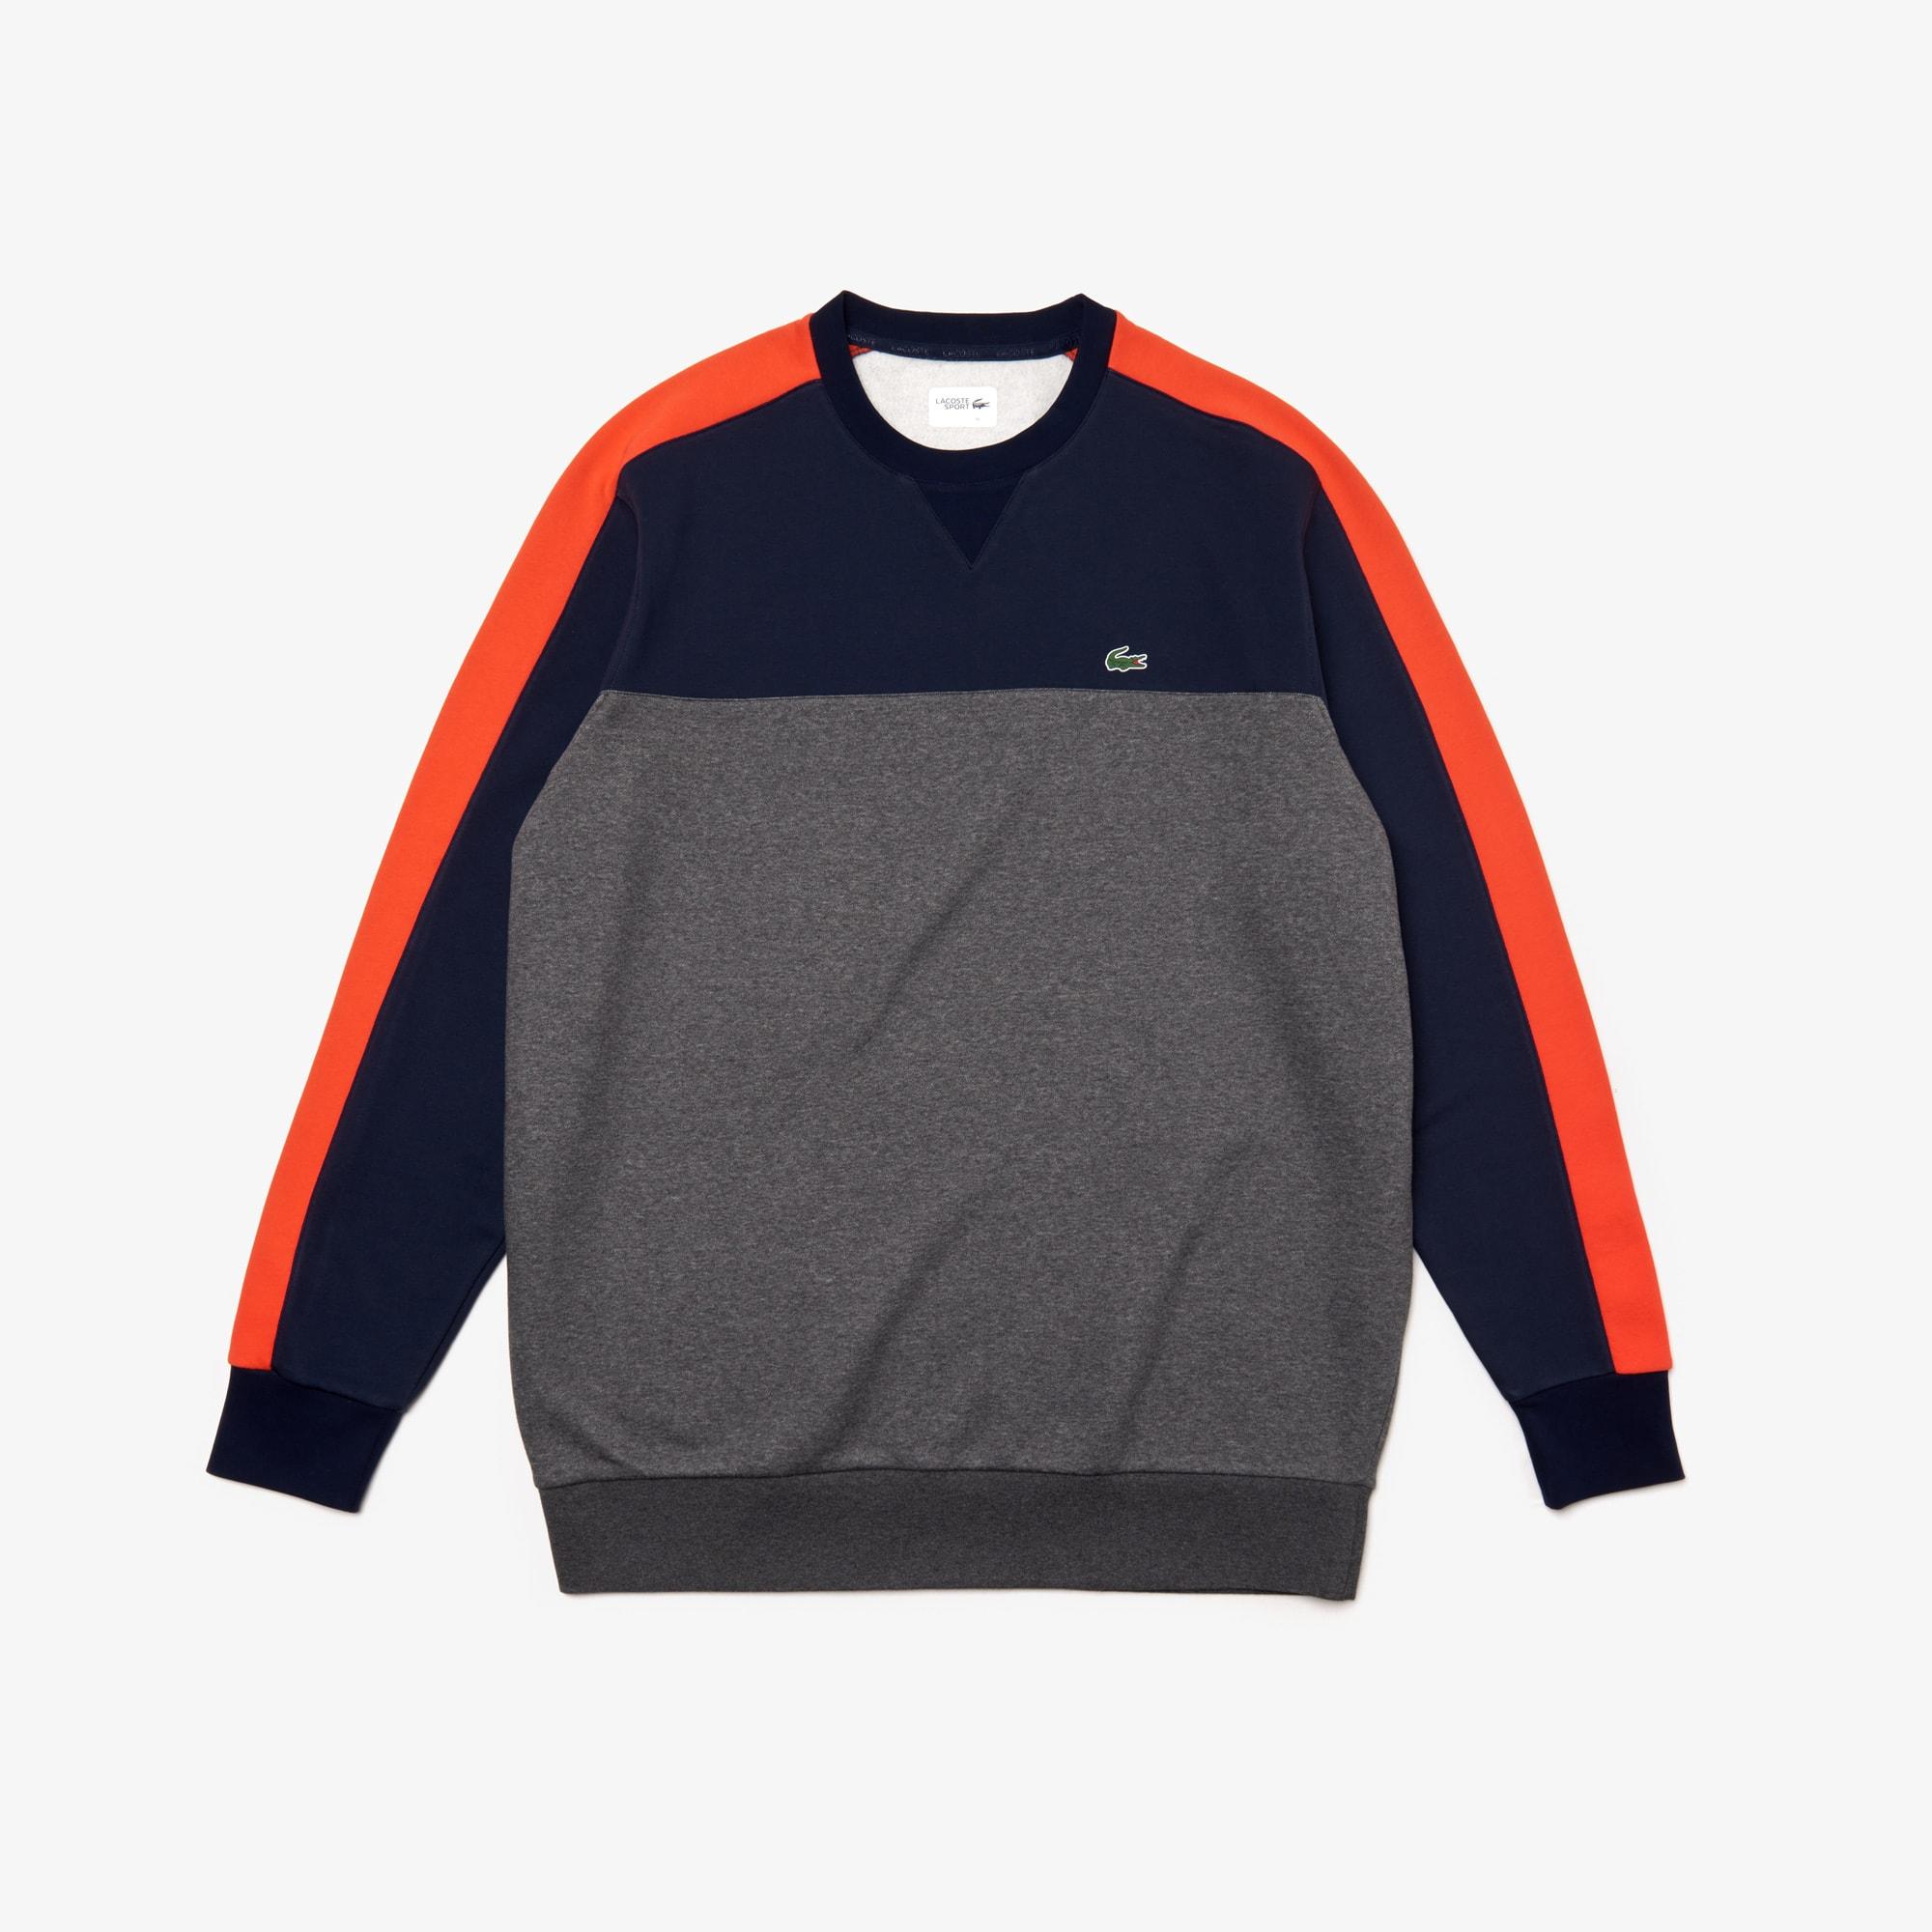 061287b931 Sweatshirt col rond Lacoste Sport grande largeur color-block